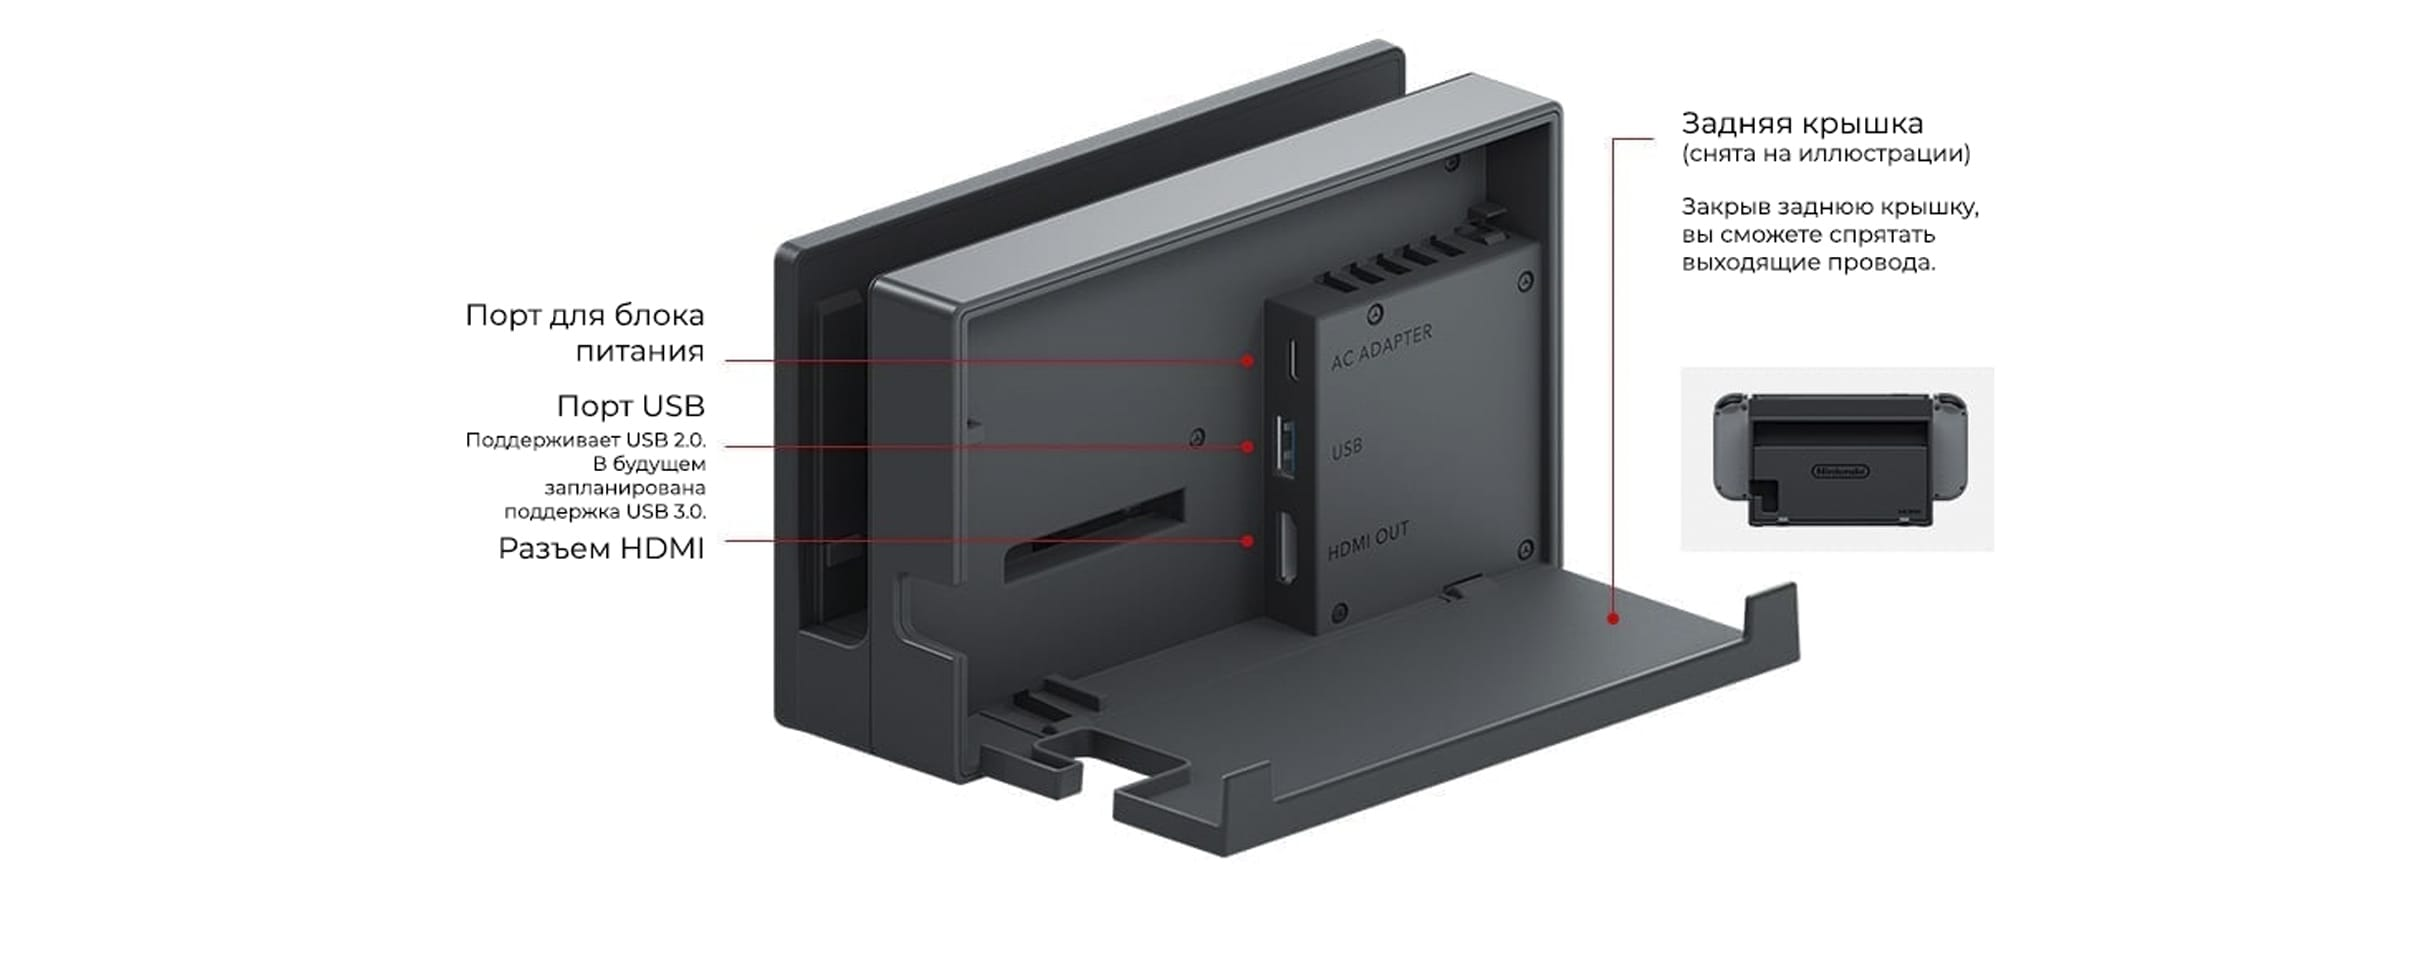 Док-станция Nintendo Switch, вид снизу